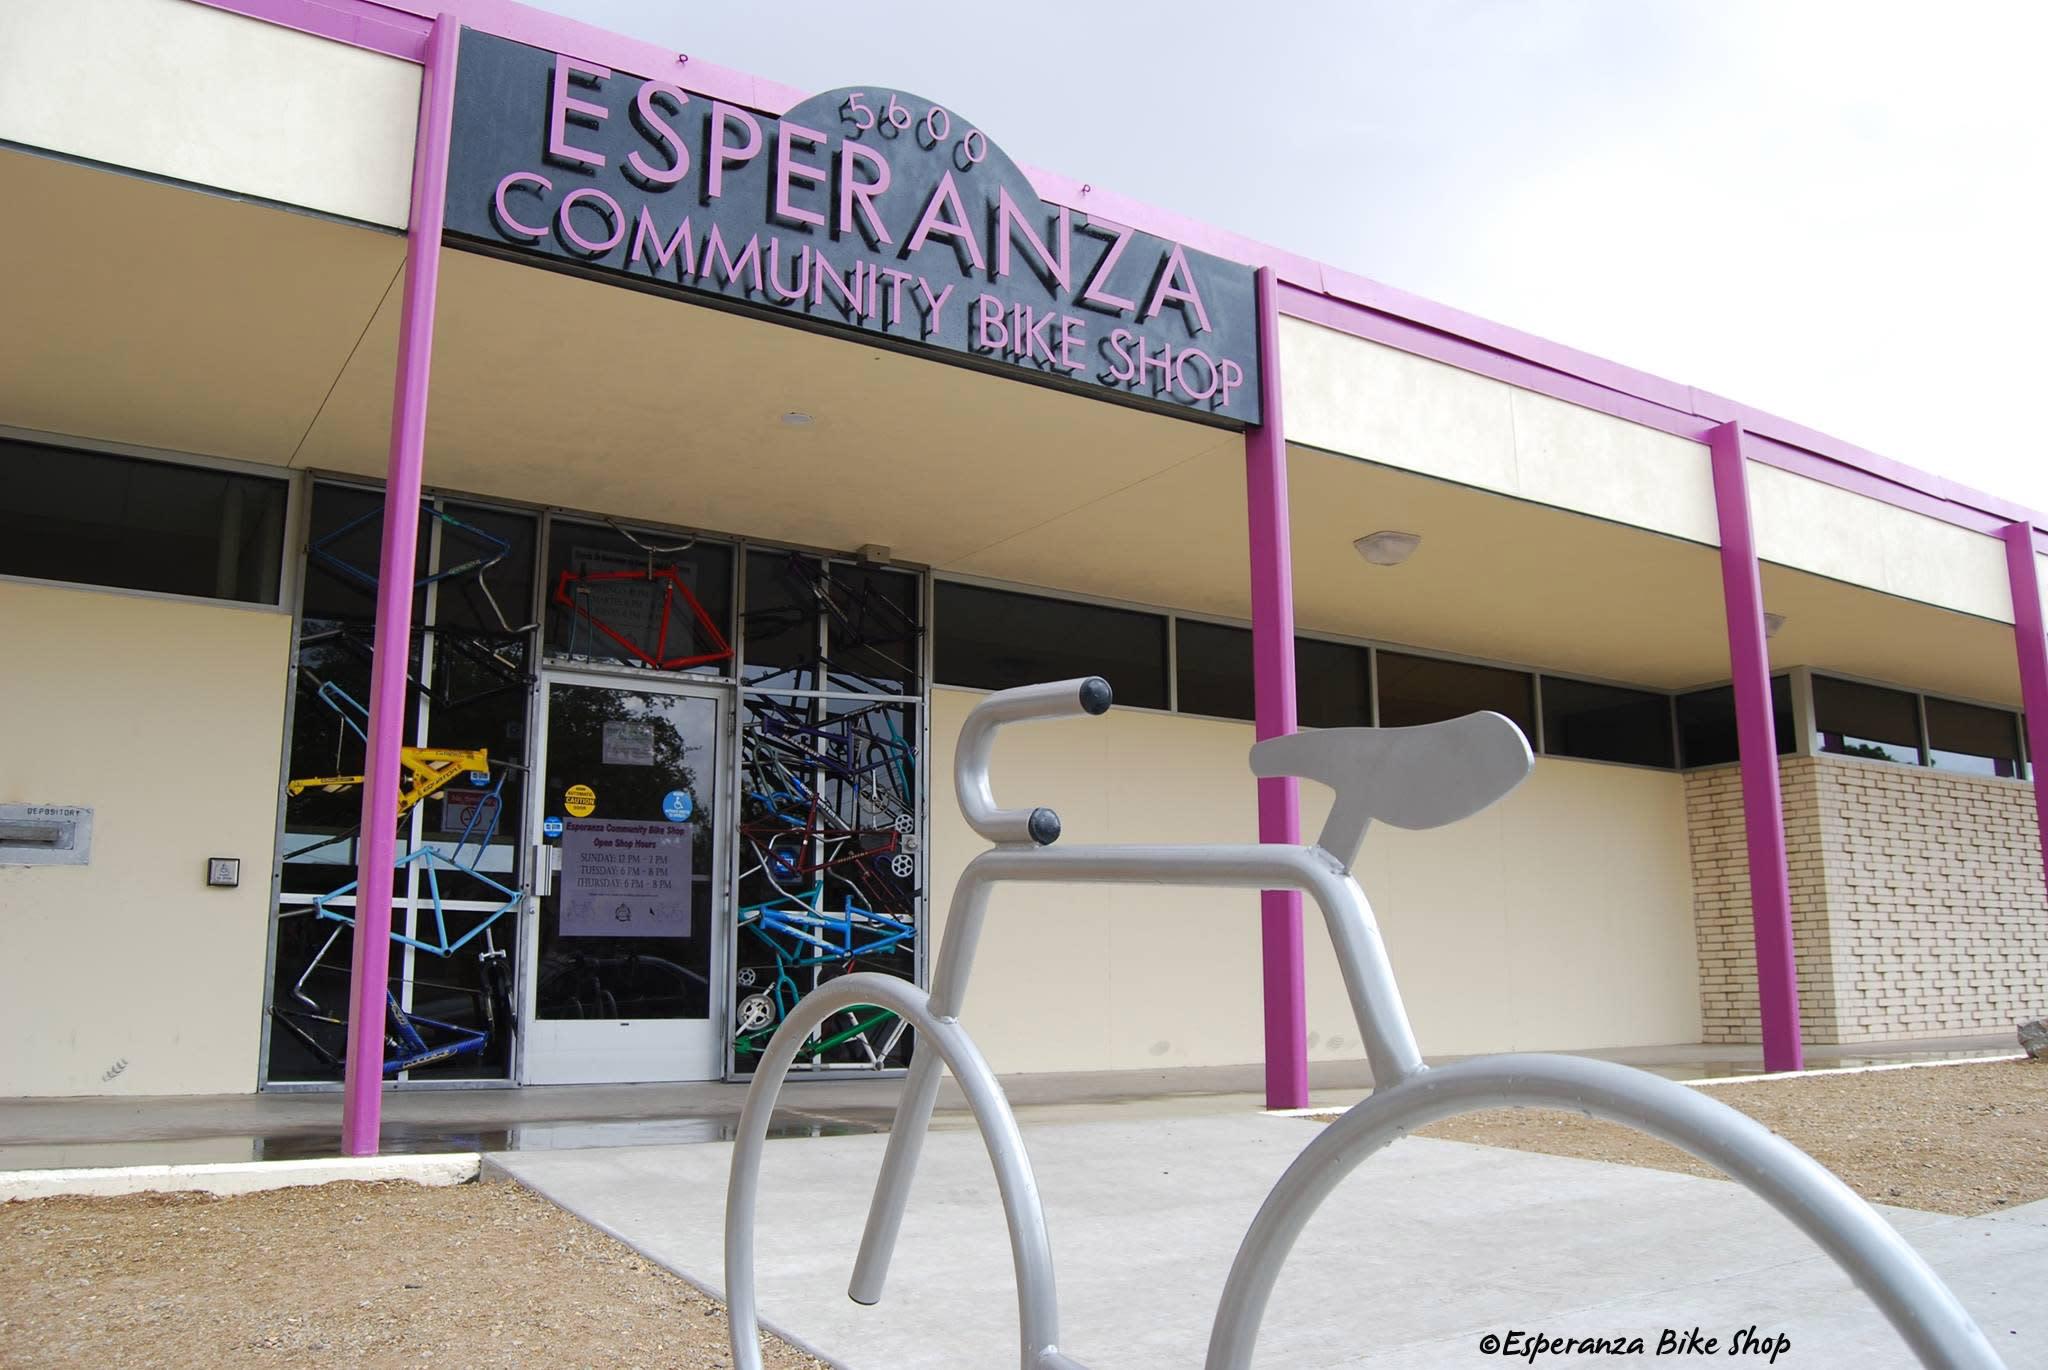 Esperanza Community Bike Shop in Albuquerque